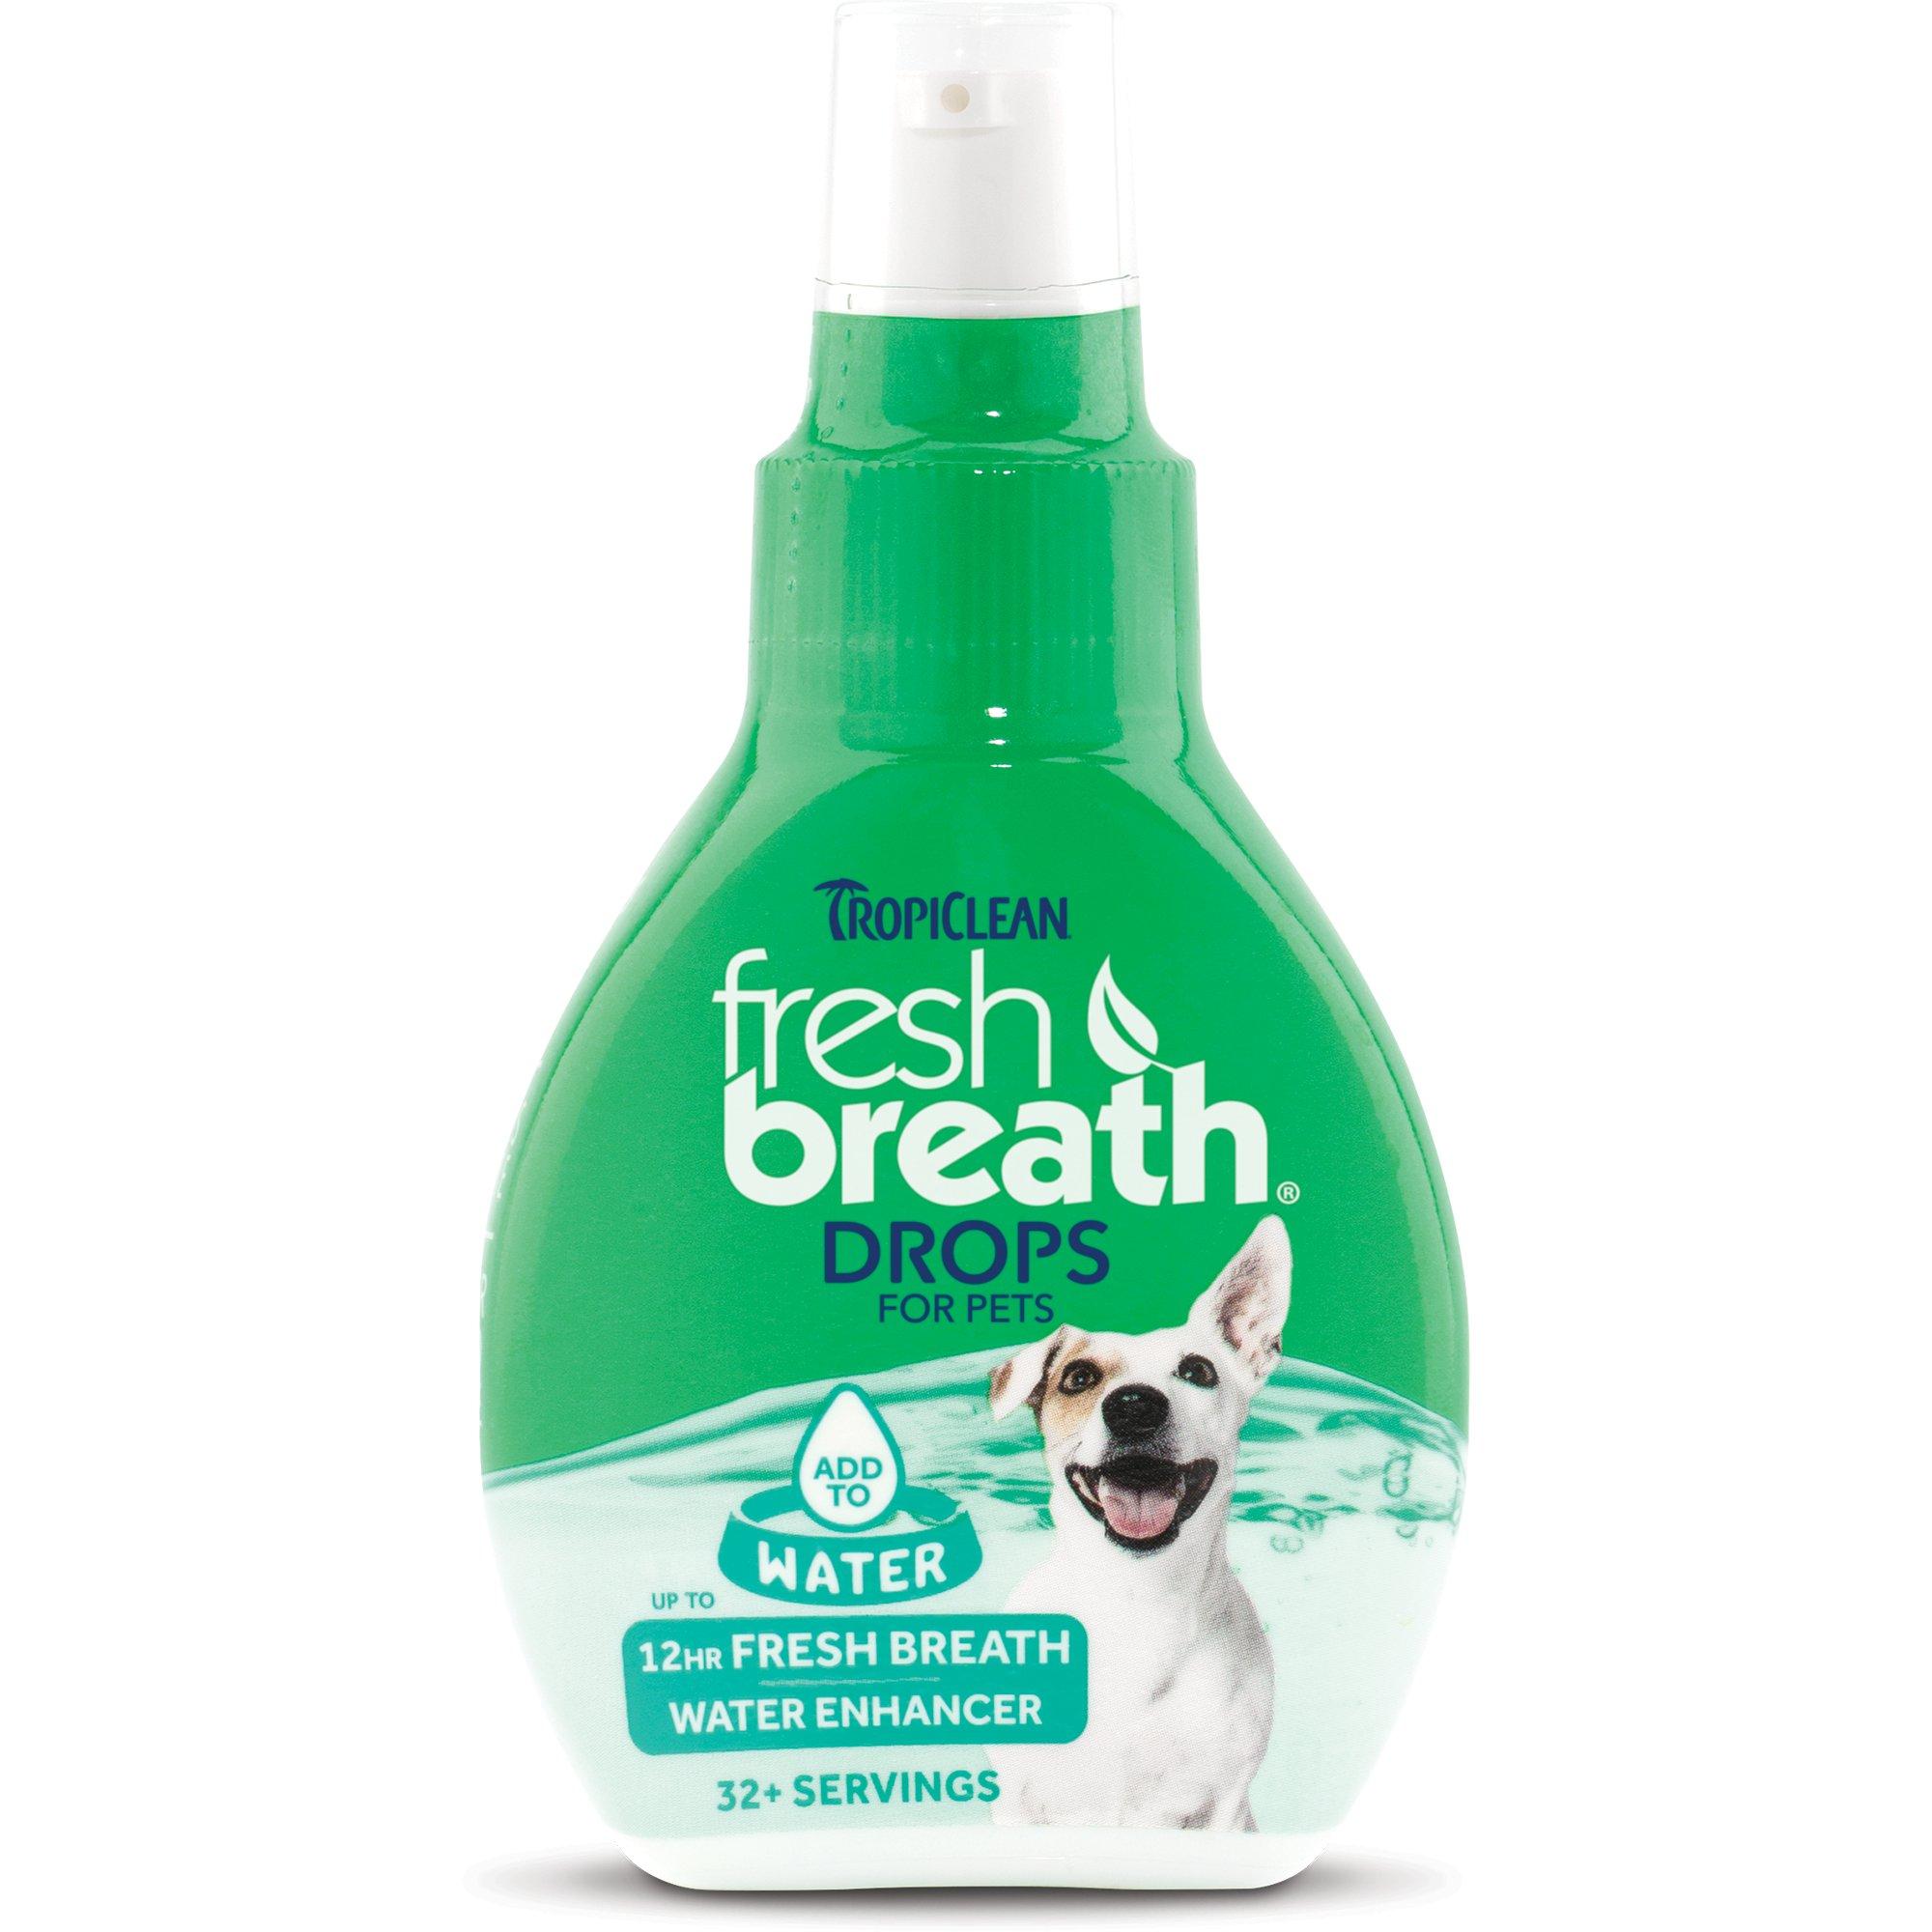 TropiClean Fresh Breath Pet Water Enhancer Drops | Petco